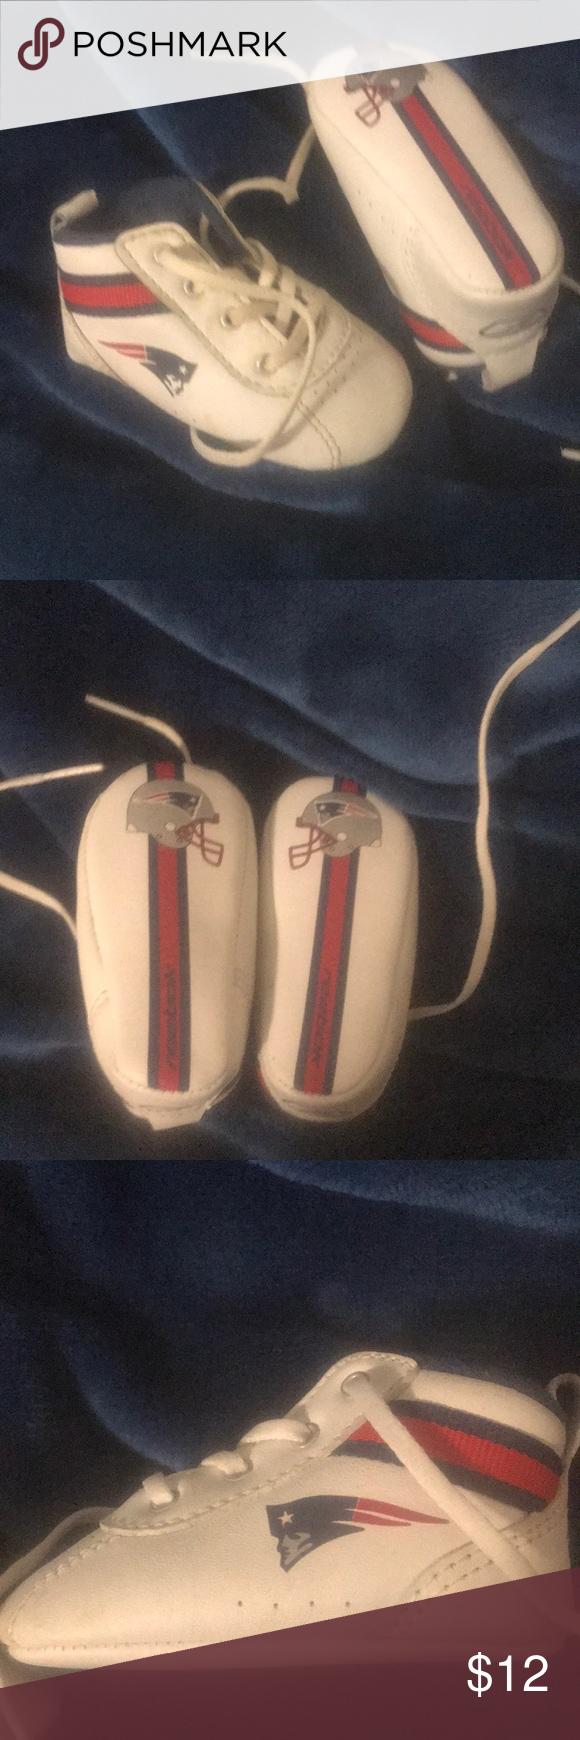 NEW ENGLAND PATRIOTS Boys' Water Shoes - Bob's Stores |New England Patriots Crib Shoes